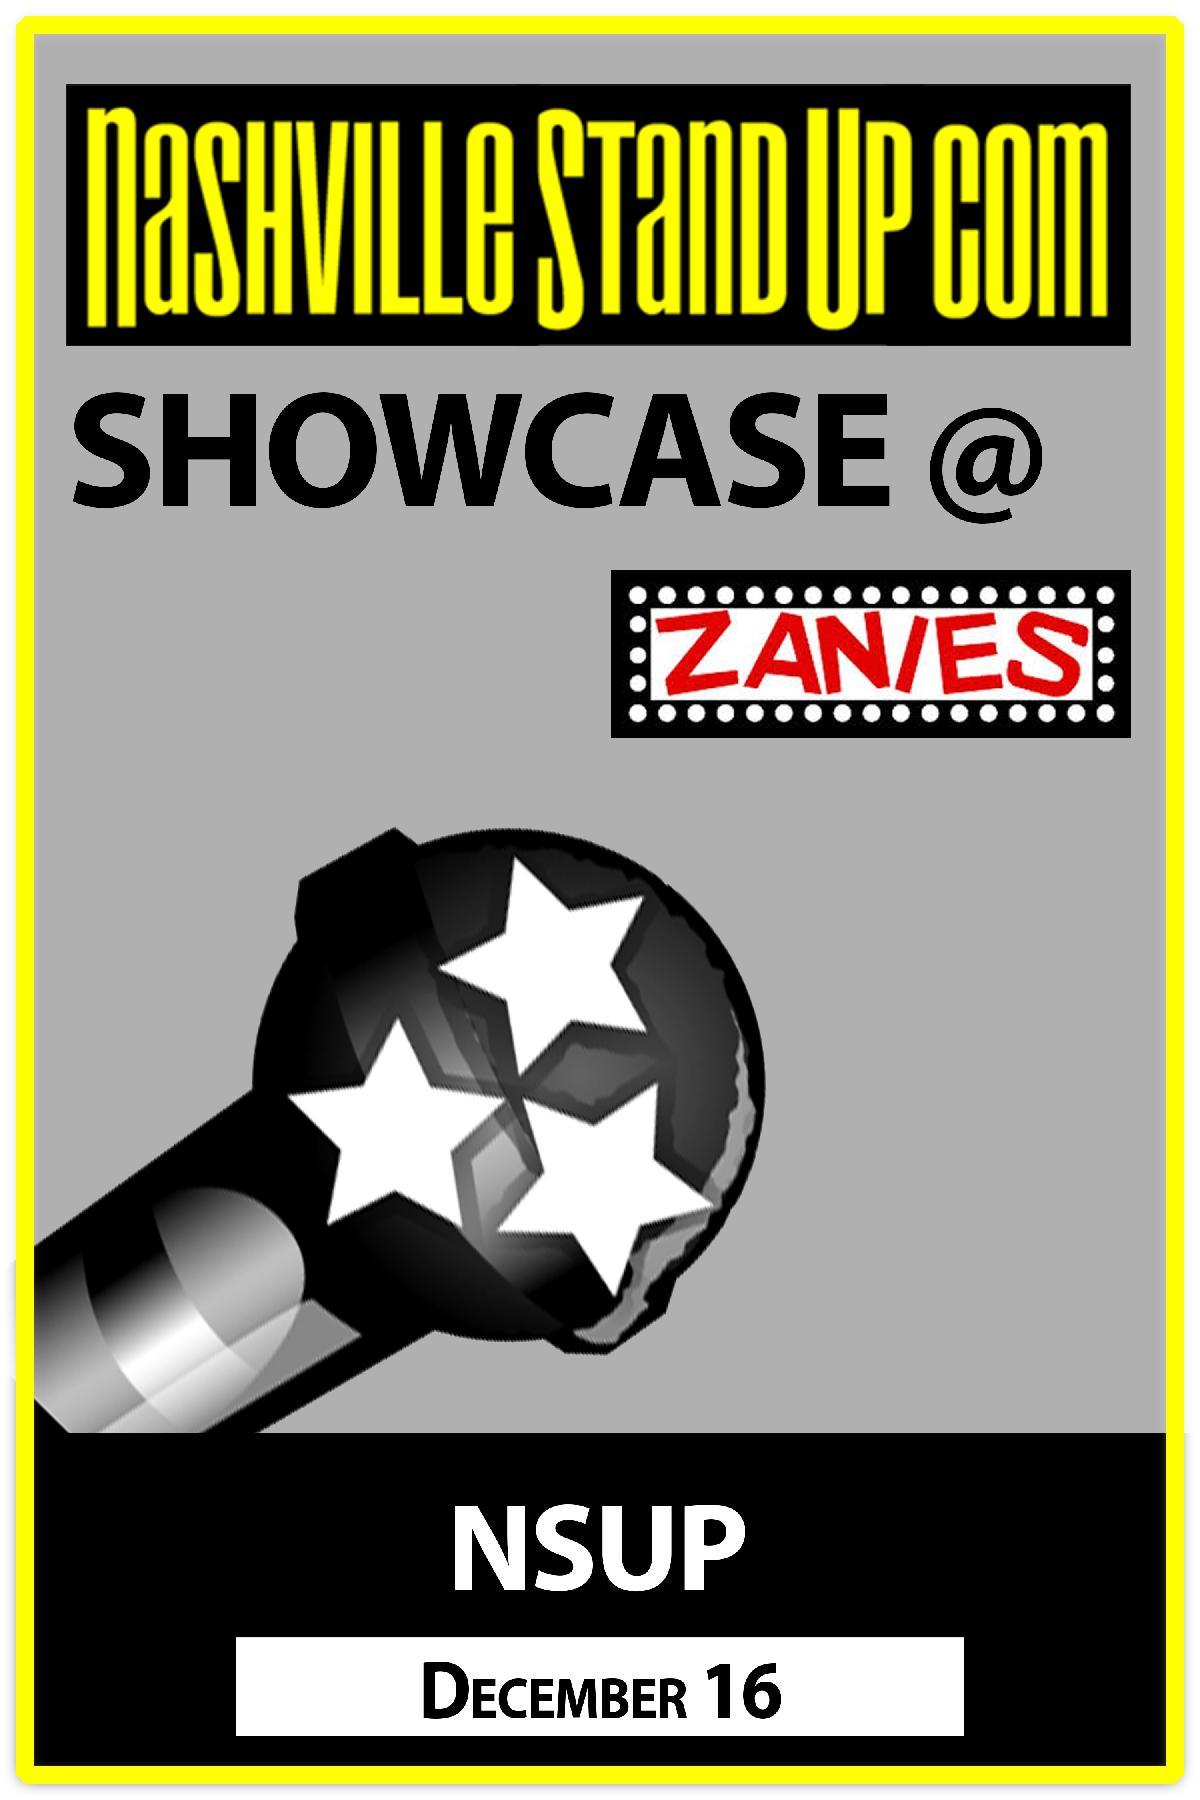 NSUP Showcase Wednesday, December 16, 2015 7:30 PM Zanies - Nashville, Nashville, TN